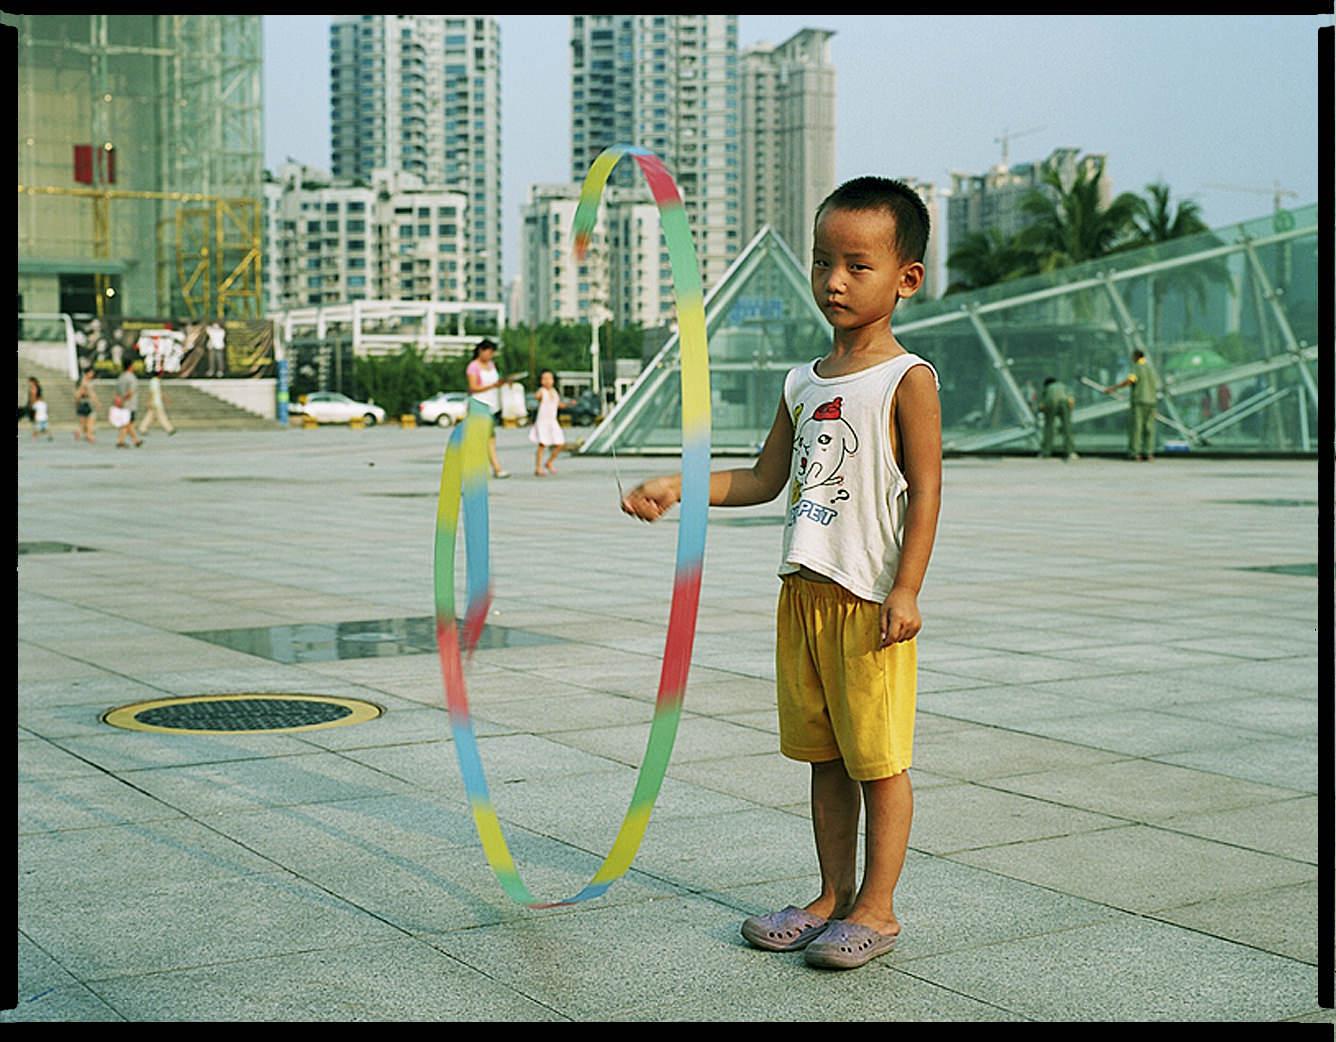 MediumFormatPatrikWallner_Shenzhen_KidsPlayingLookingIntoCamLOWQ